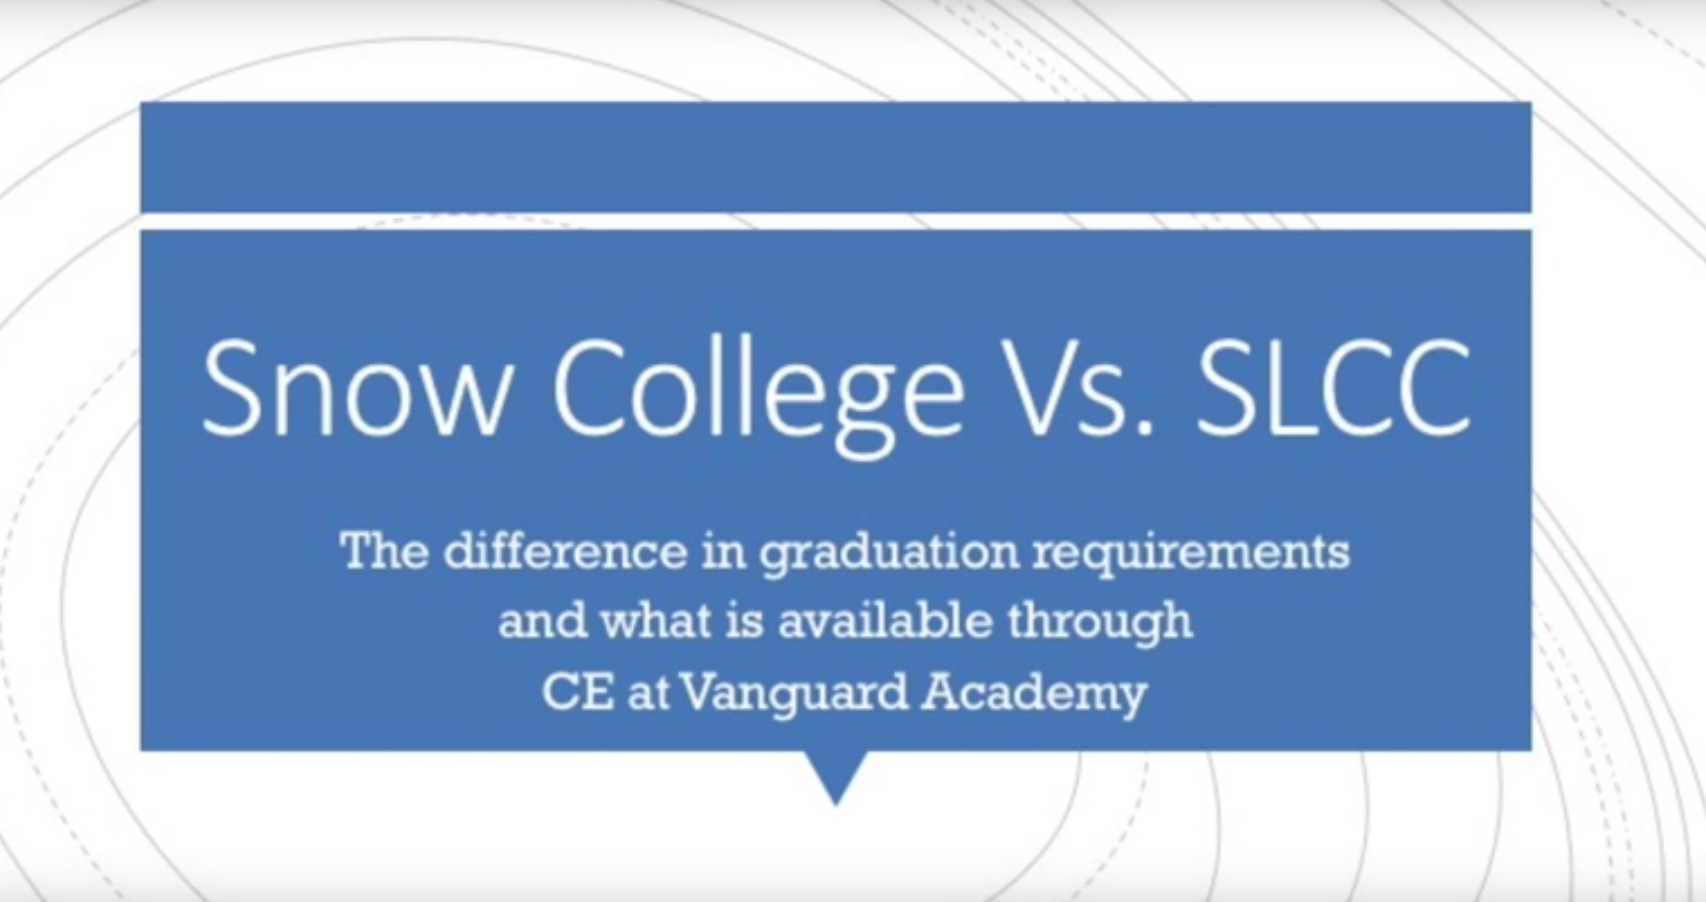 Snow College vs. SLCC